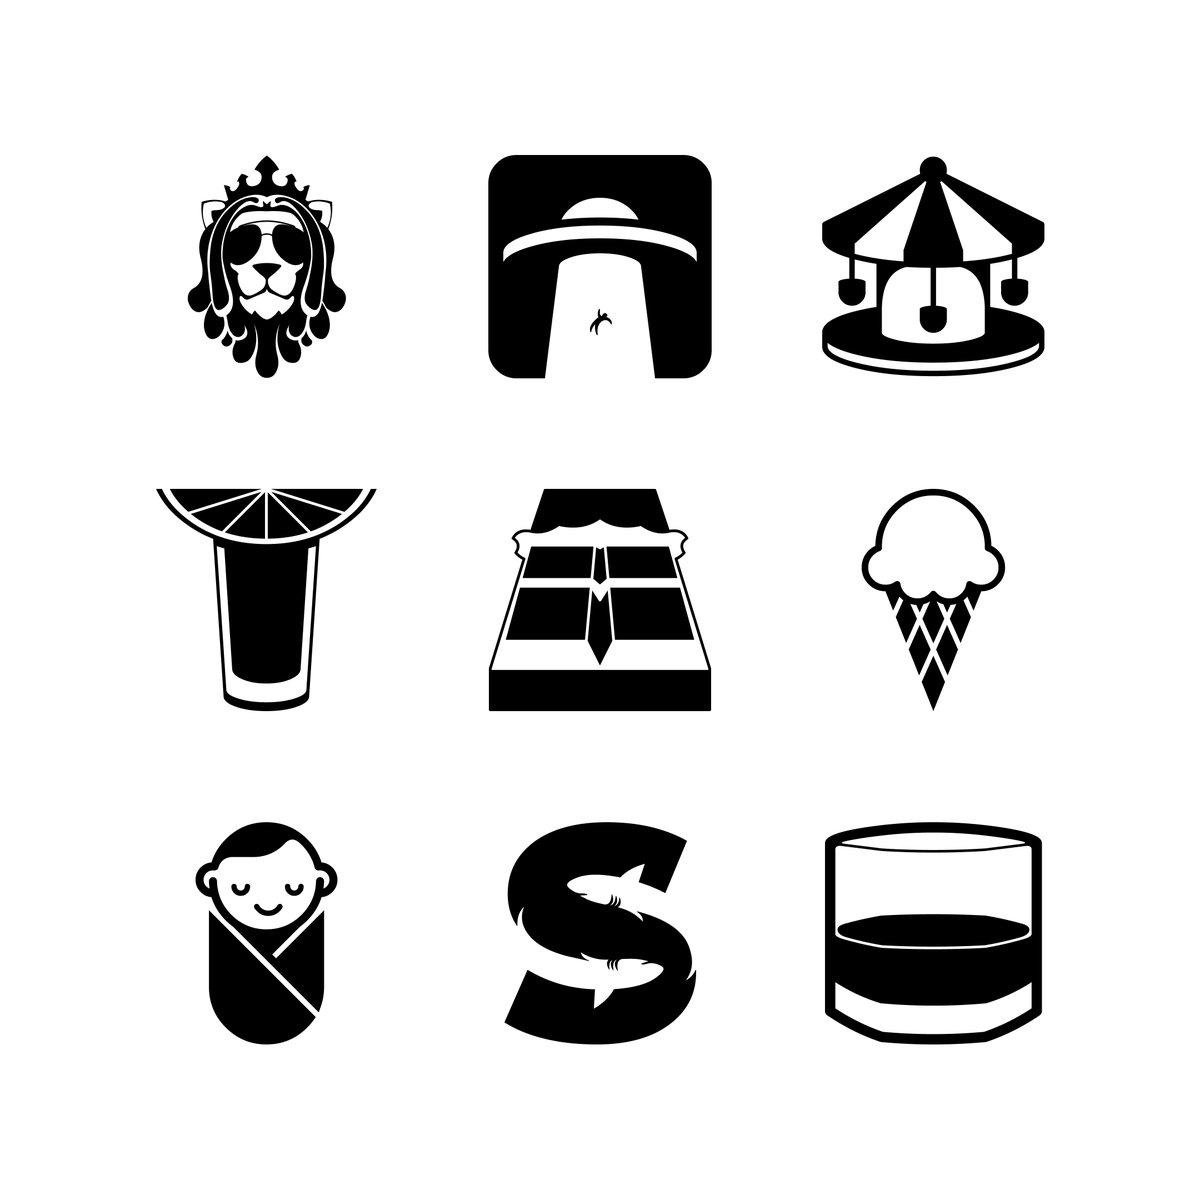 July recap with selected logo concepts.  #logoconceptday #logo #logoconcept #logodesigner #logomaker #dribbble #logofolio #logoideas #behance #logopond #logoinspirations #logoawesome #logobucket #logolearn #logoworlddesigners #logosix #logodesignershub #logobook  #logoadorepic.twitter.com/rpyxG7lgOf